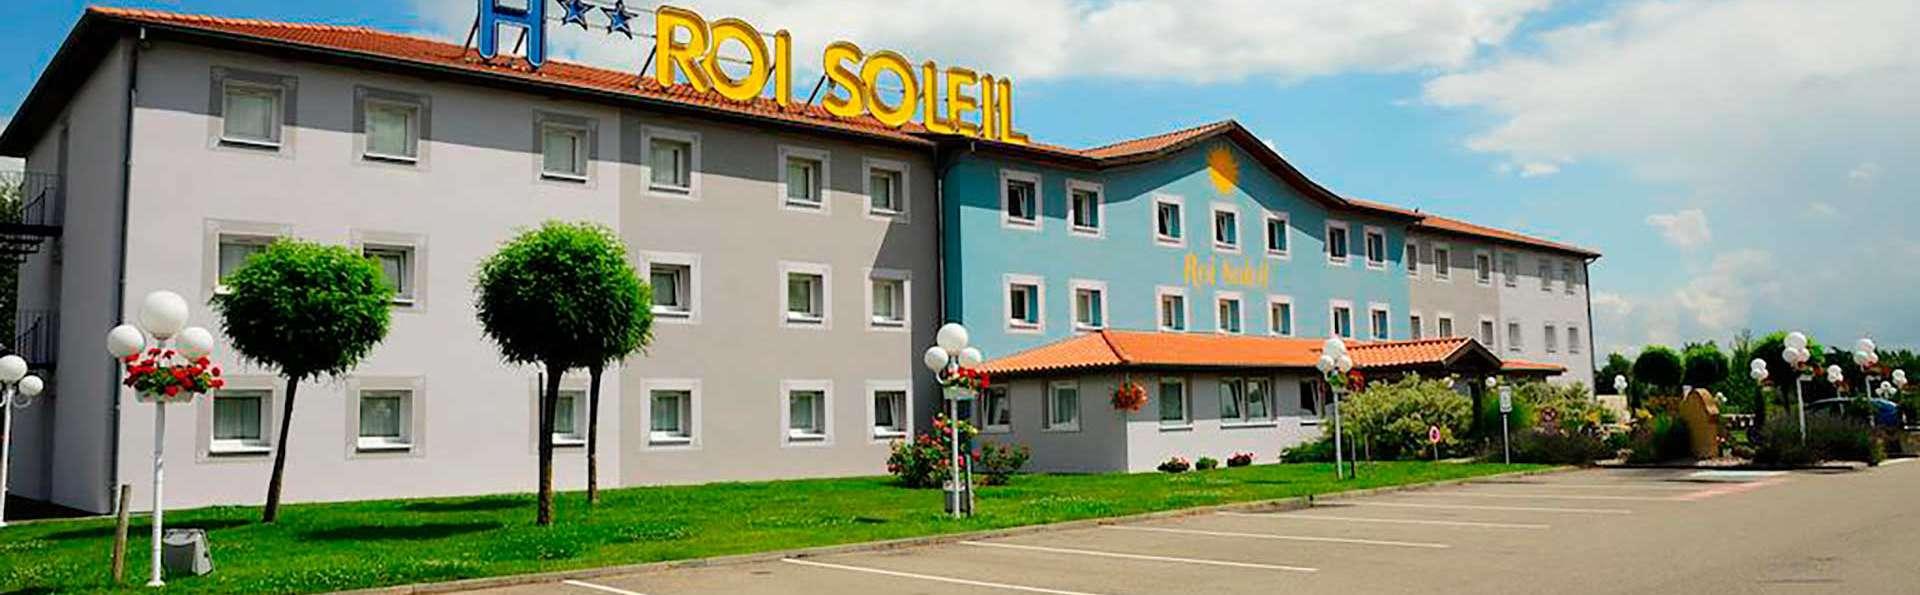 Hôtel Roi Soleil Colmar - Edit_Front2.jpg